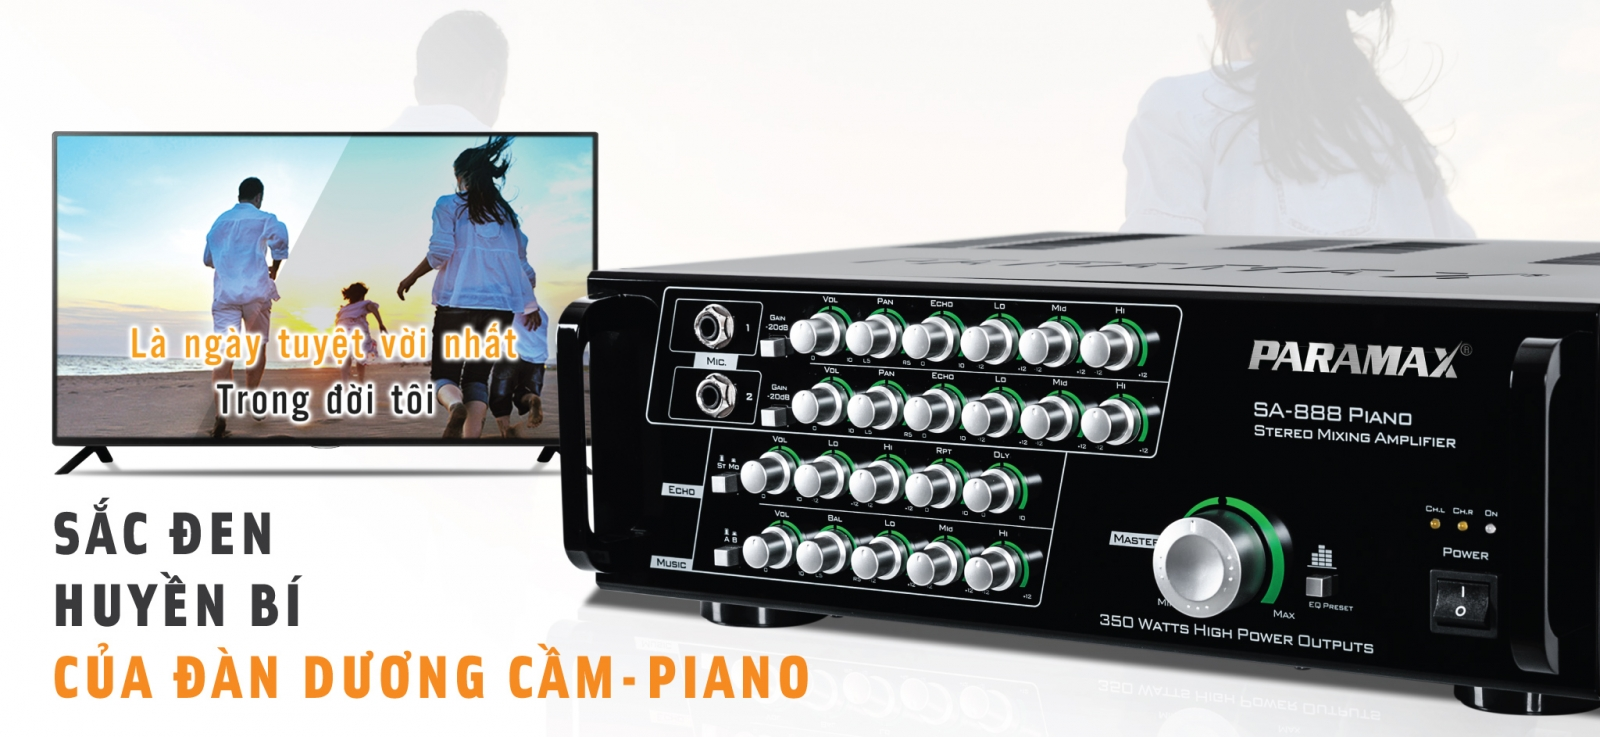 Ampli-Paramax-sa-888-piano-tai-bao-chau-elec